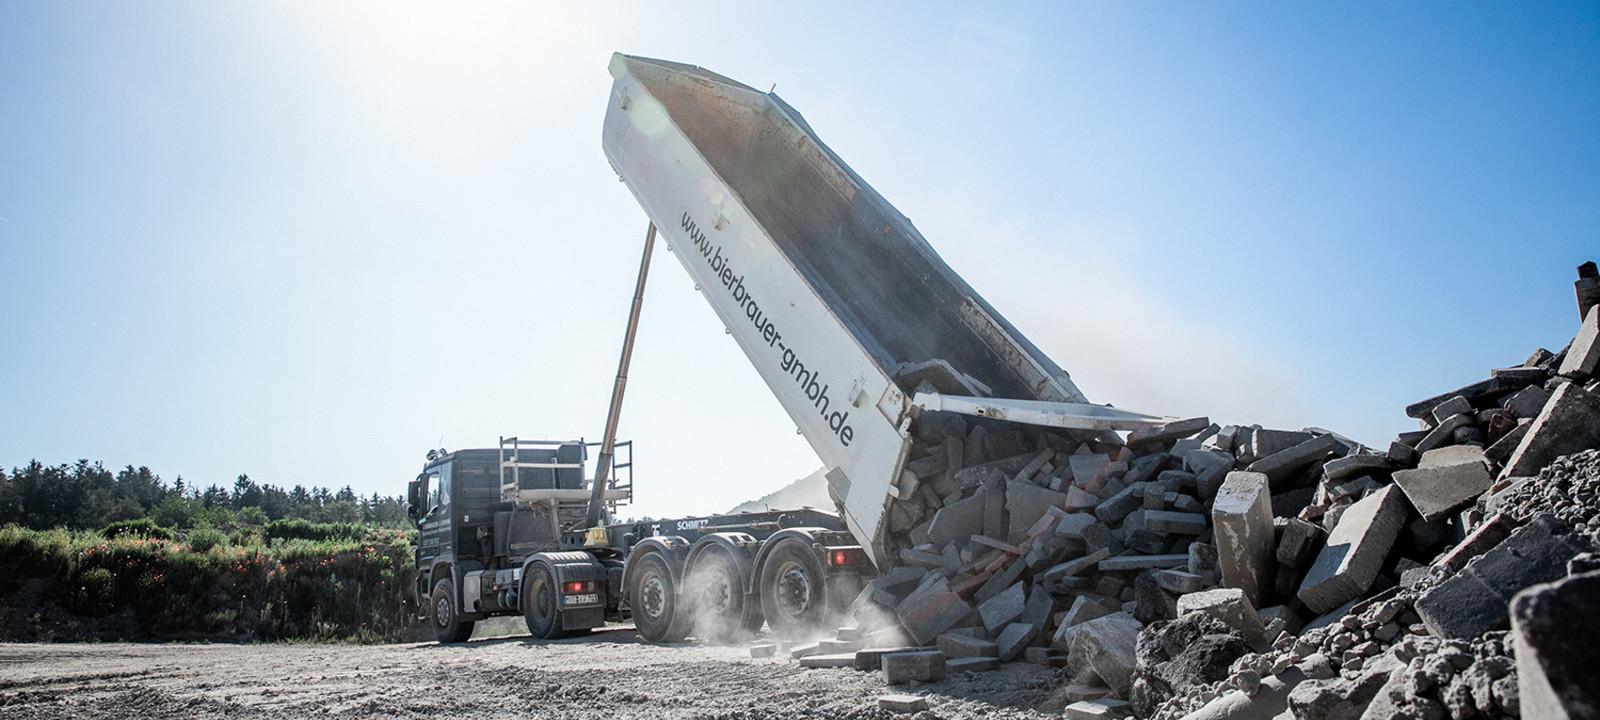 Anlieferung Betonsteine Recycling Anlage